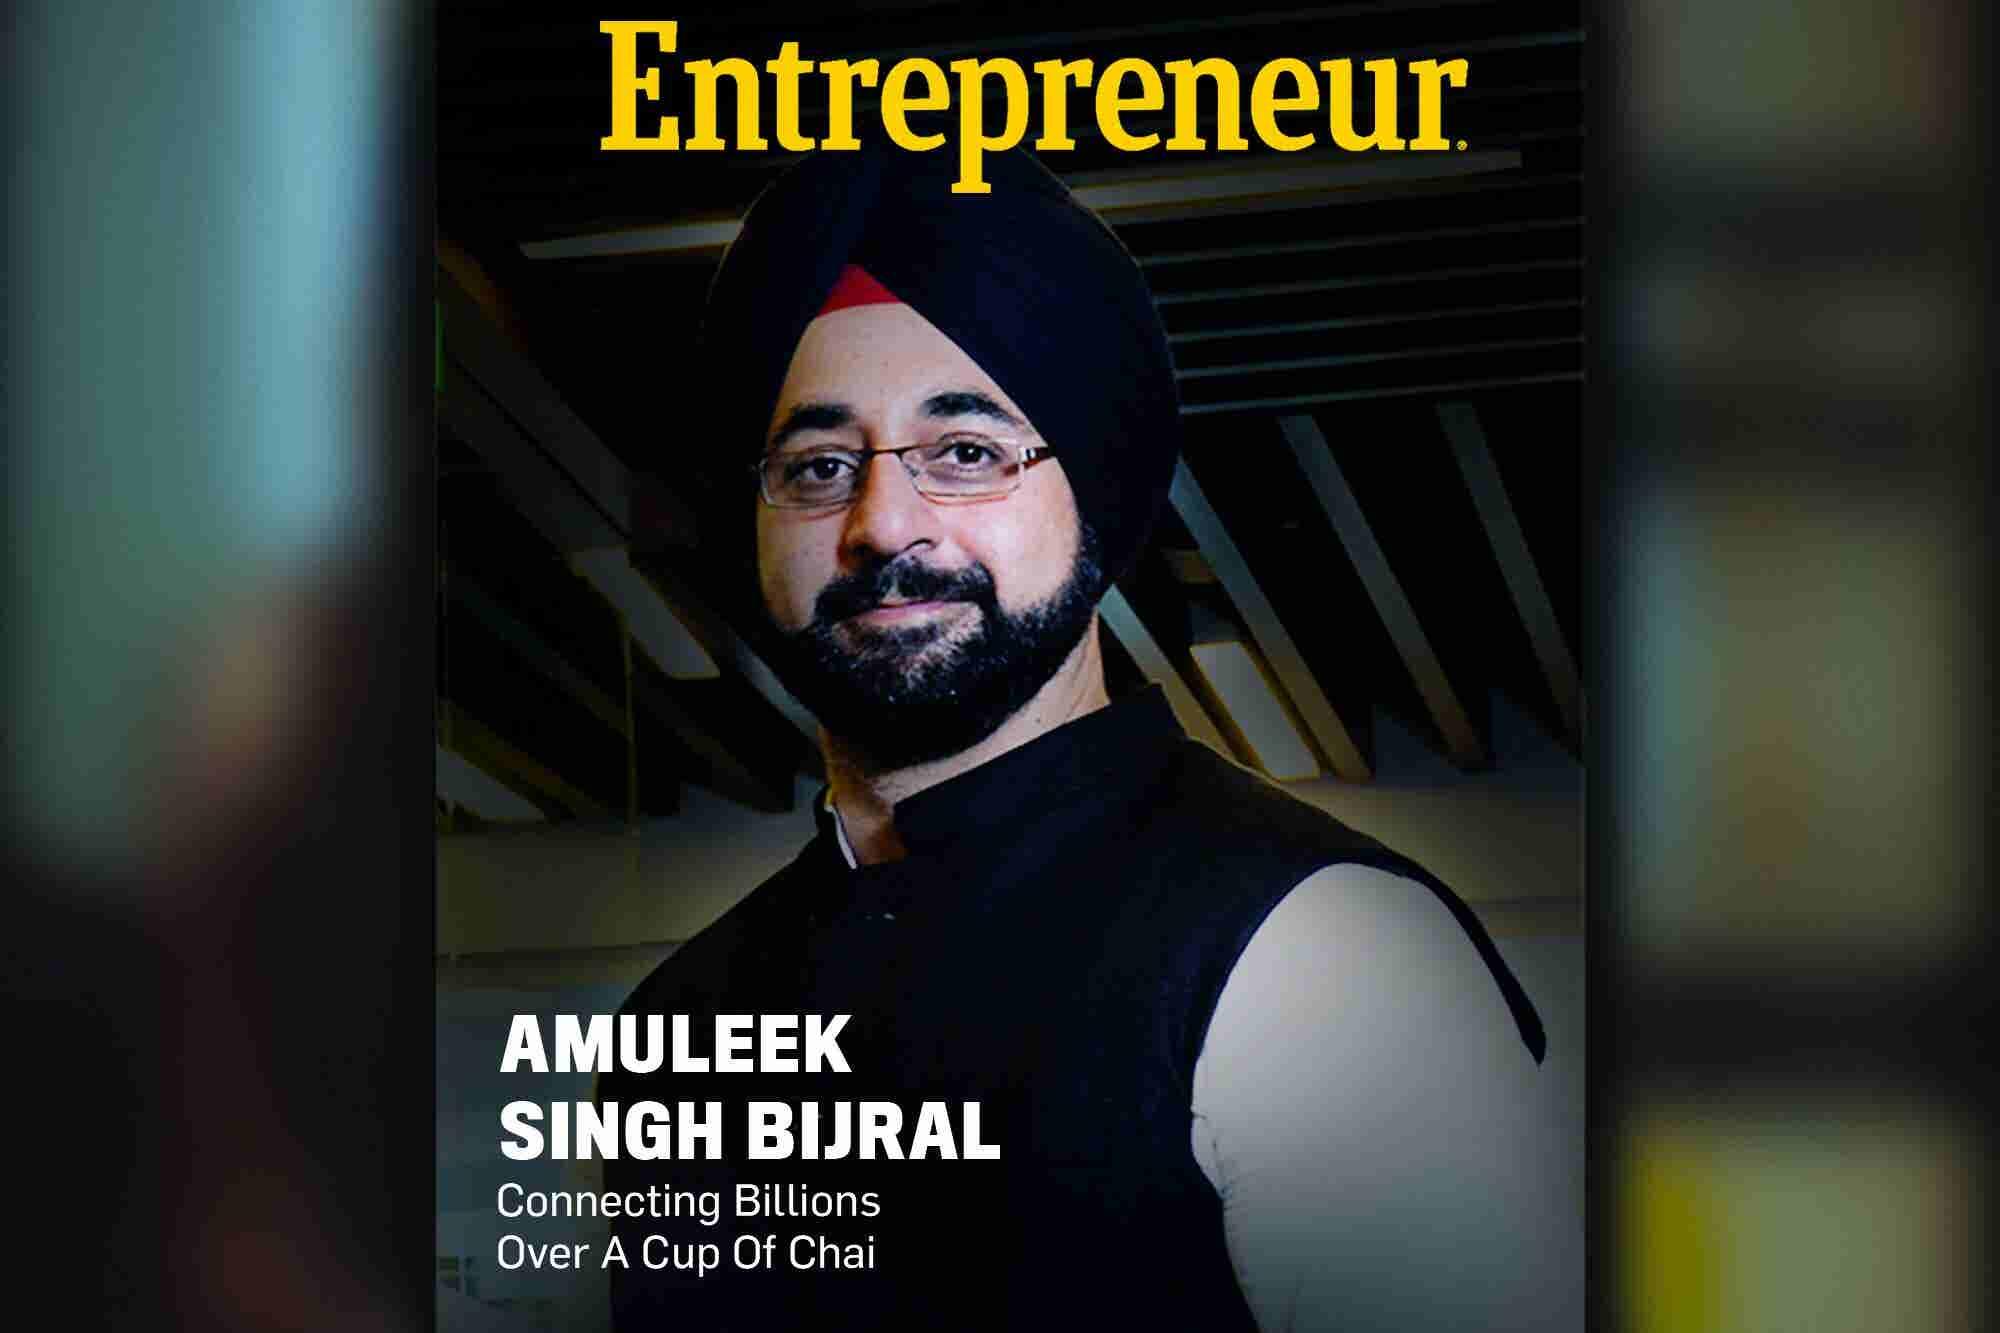 Entrepreneur India's Second Digital Cover Presents India's Chai Grand Master Amuleek Singh Bijral